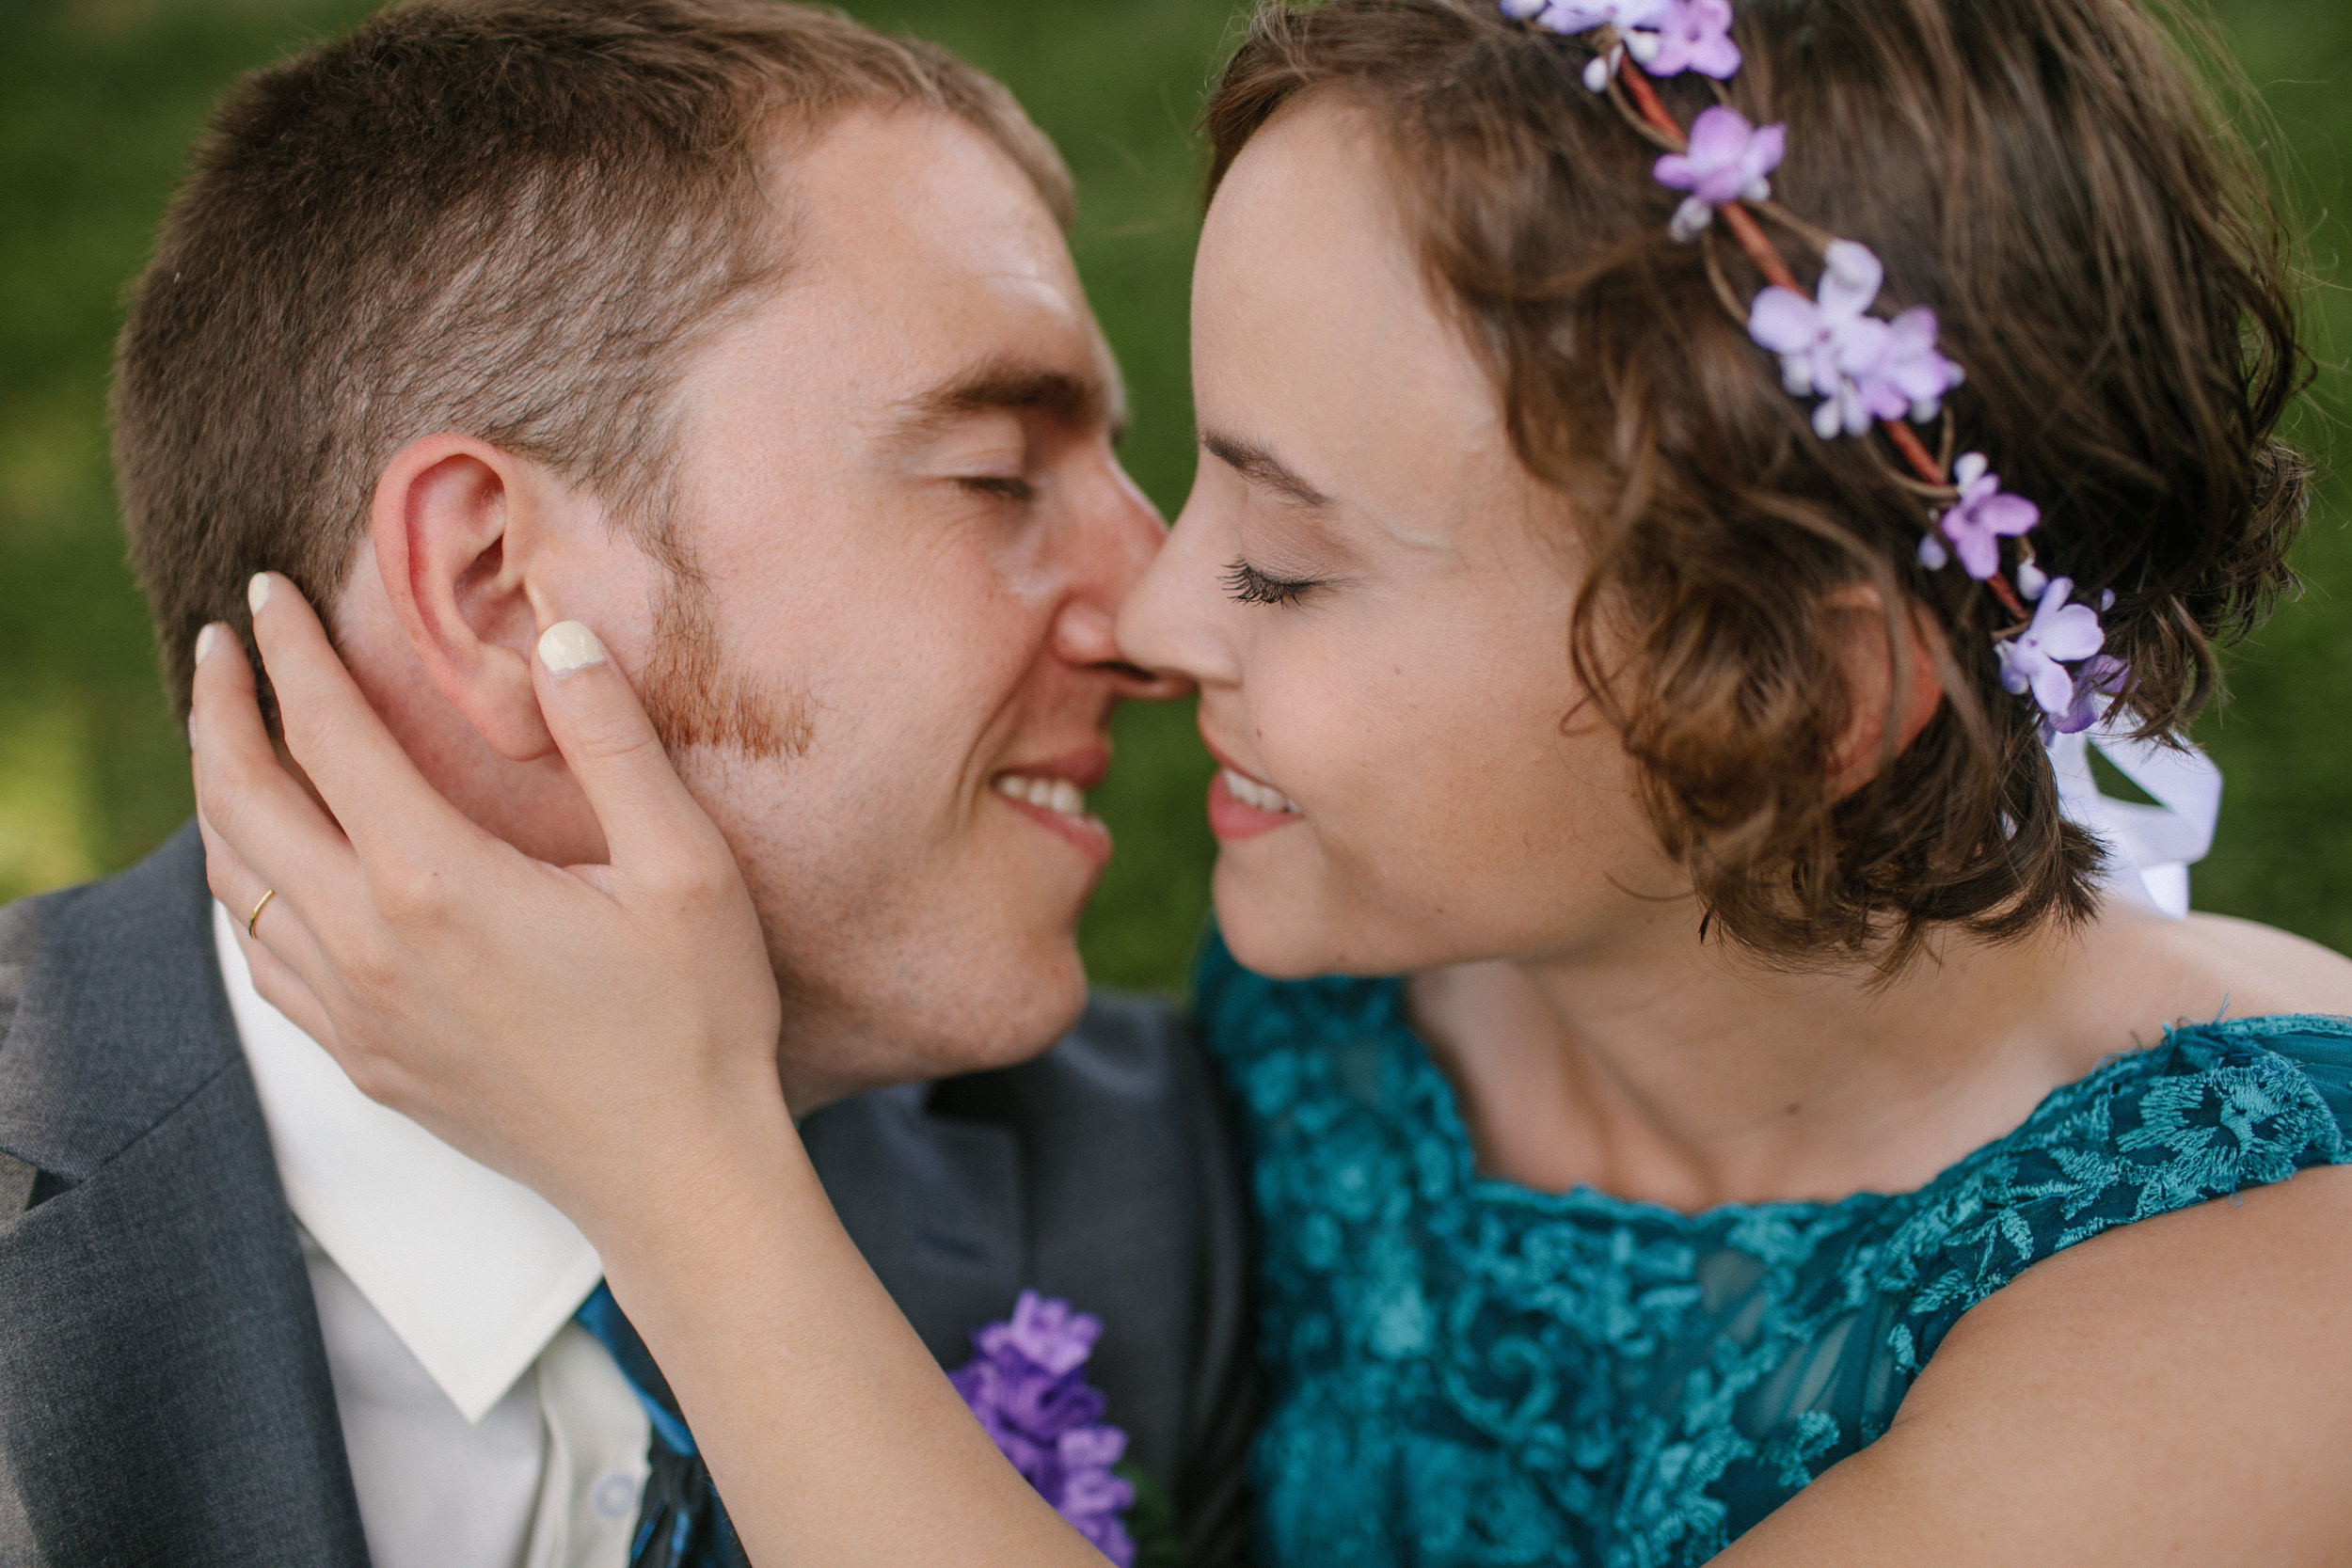 minneapolis wedding photographers affordable under $3K digital files